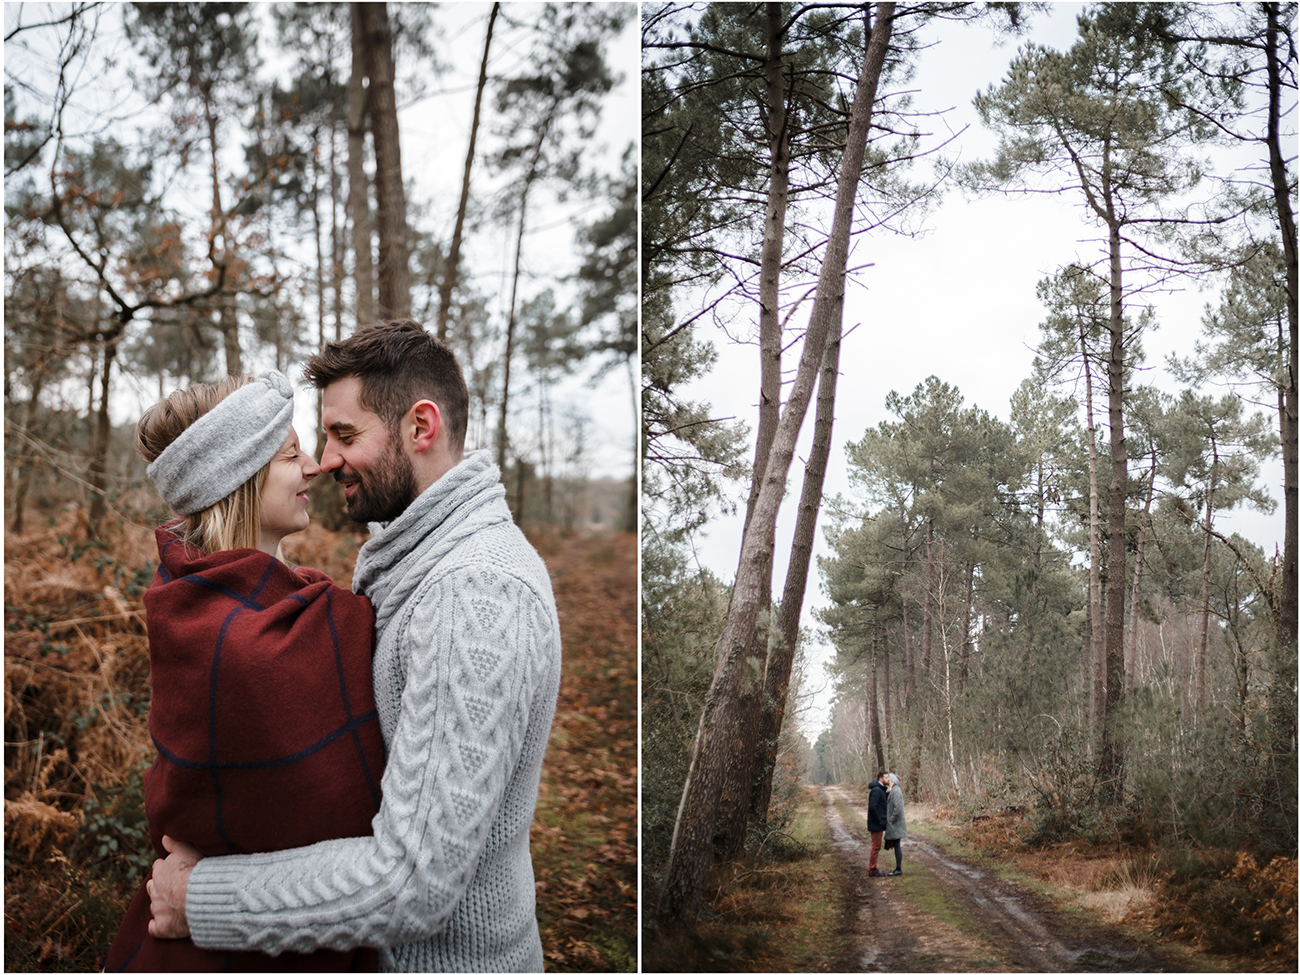 photographe-bordeaux-emeline-mingot-couple-6